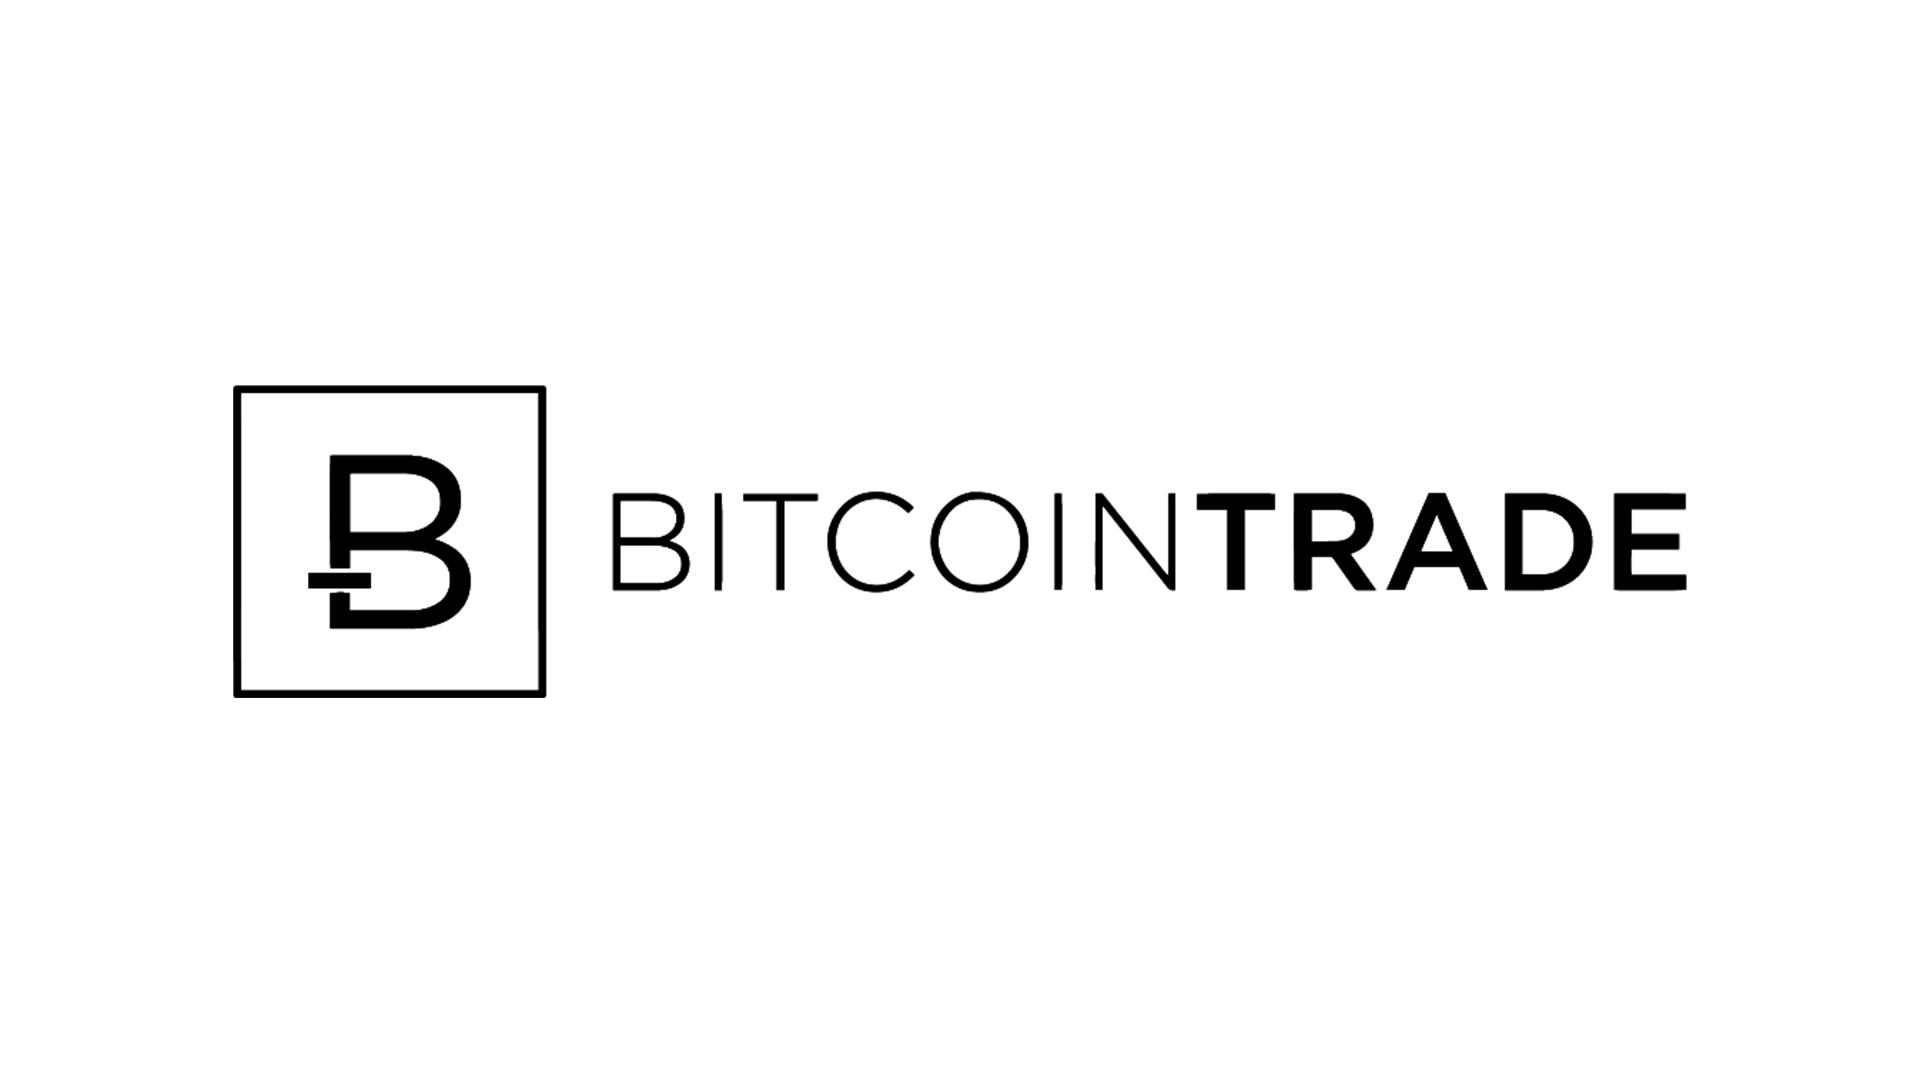 (Source: BitcoinTrade / Reproduction)